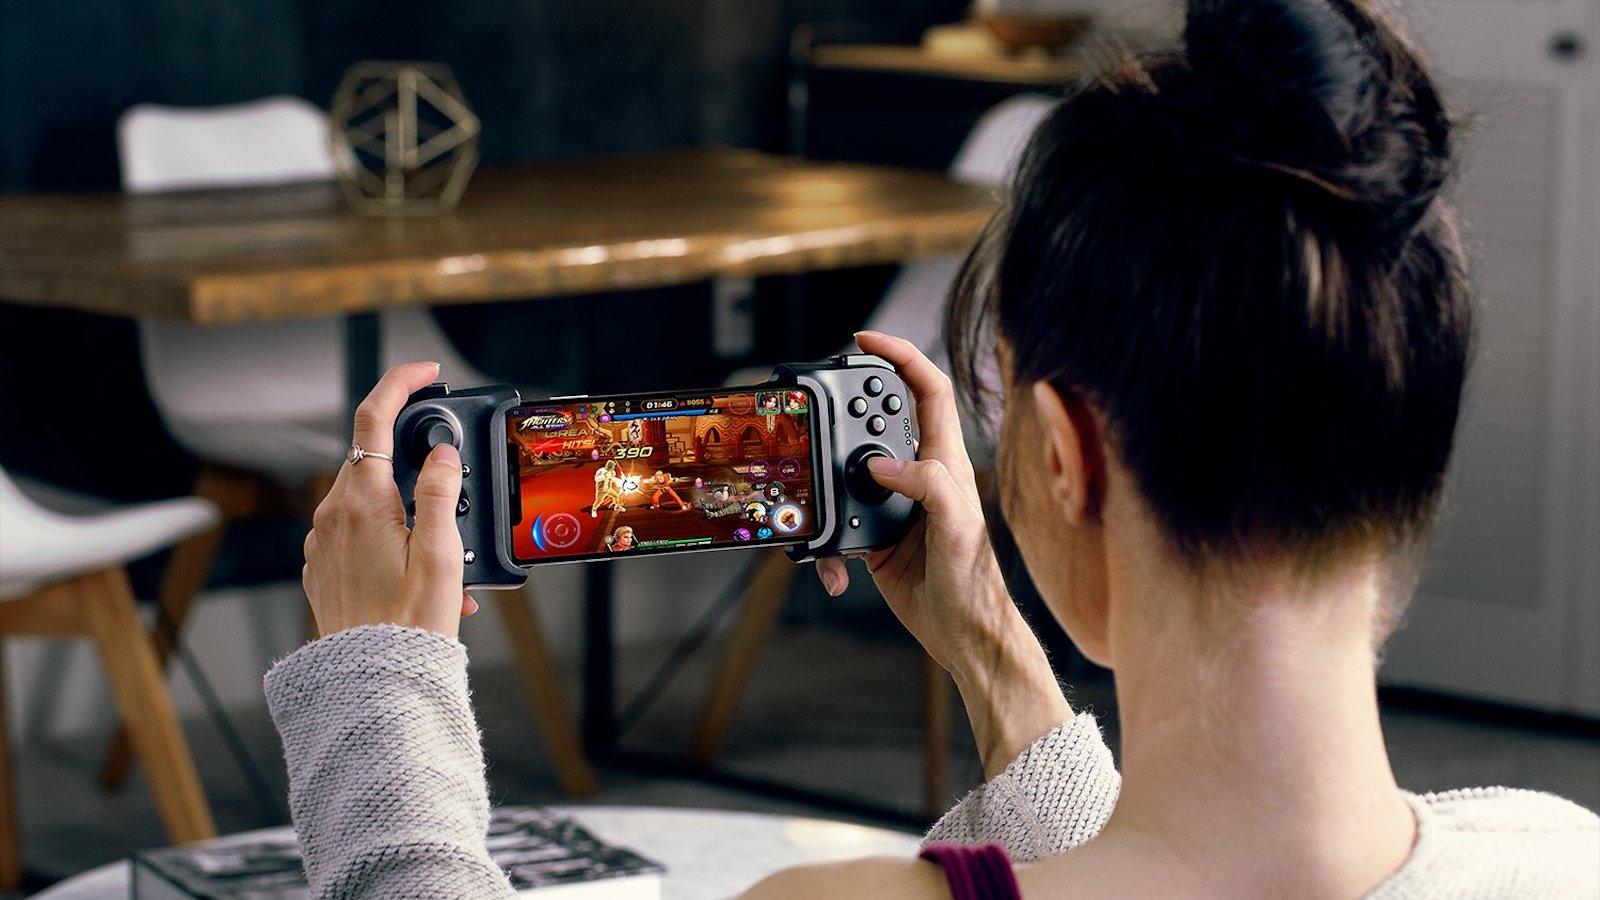 Razer Kishi iOS gaming controller gives you console-level control